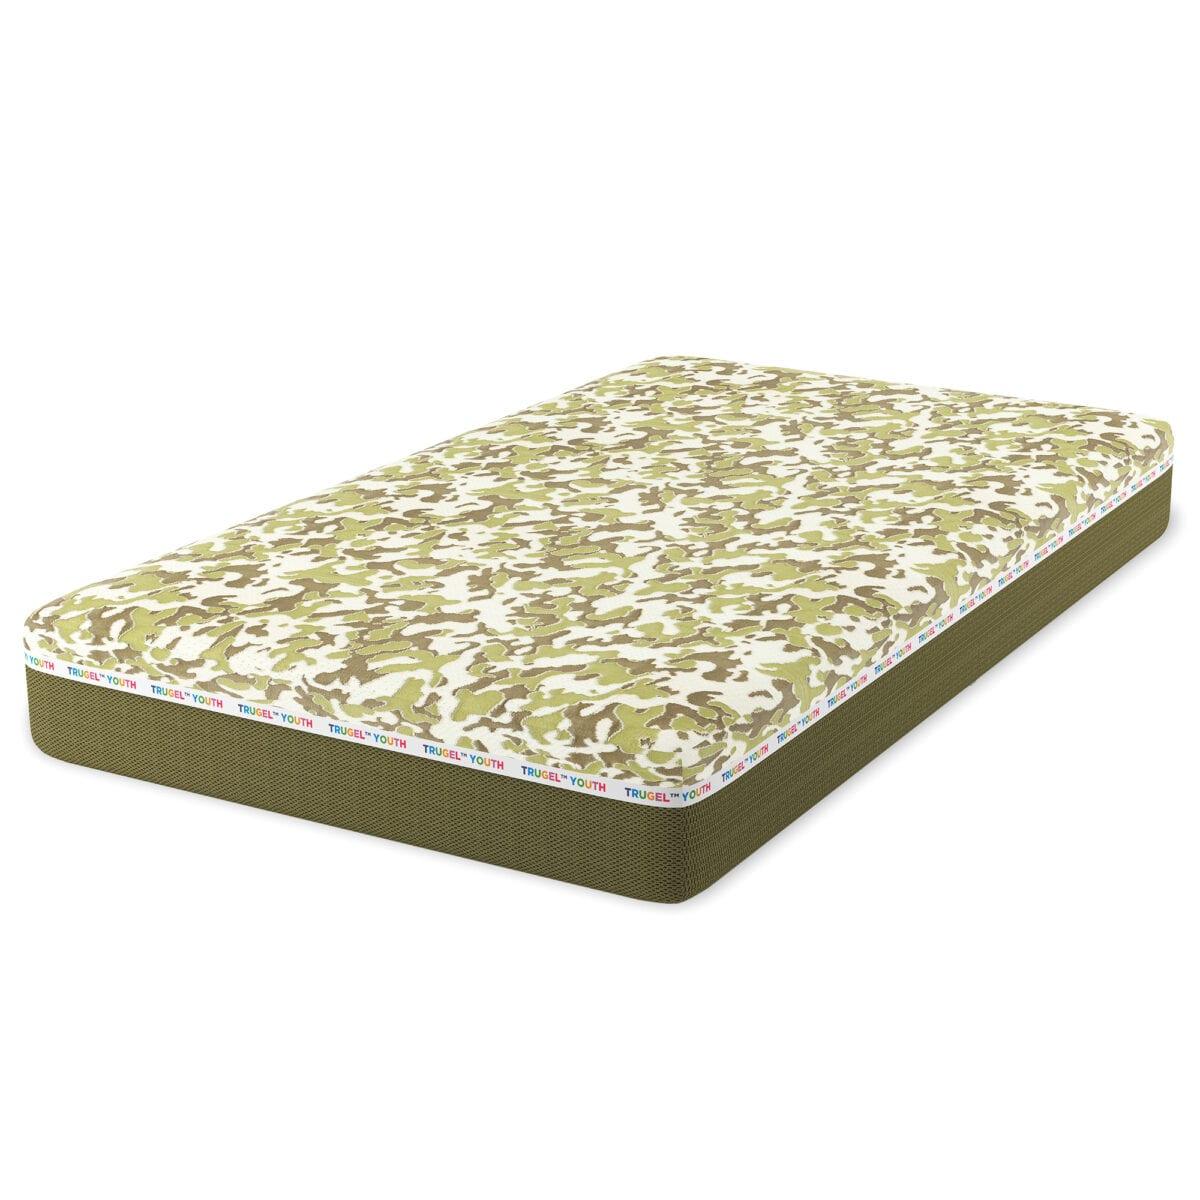 Image of Camouflage Youth Memory Foam Mattress